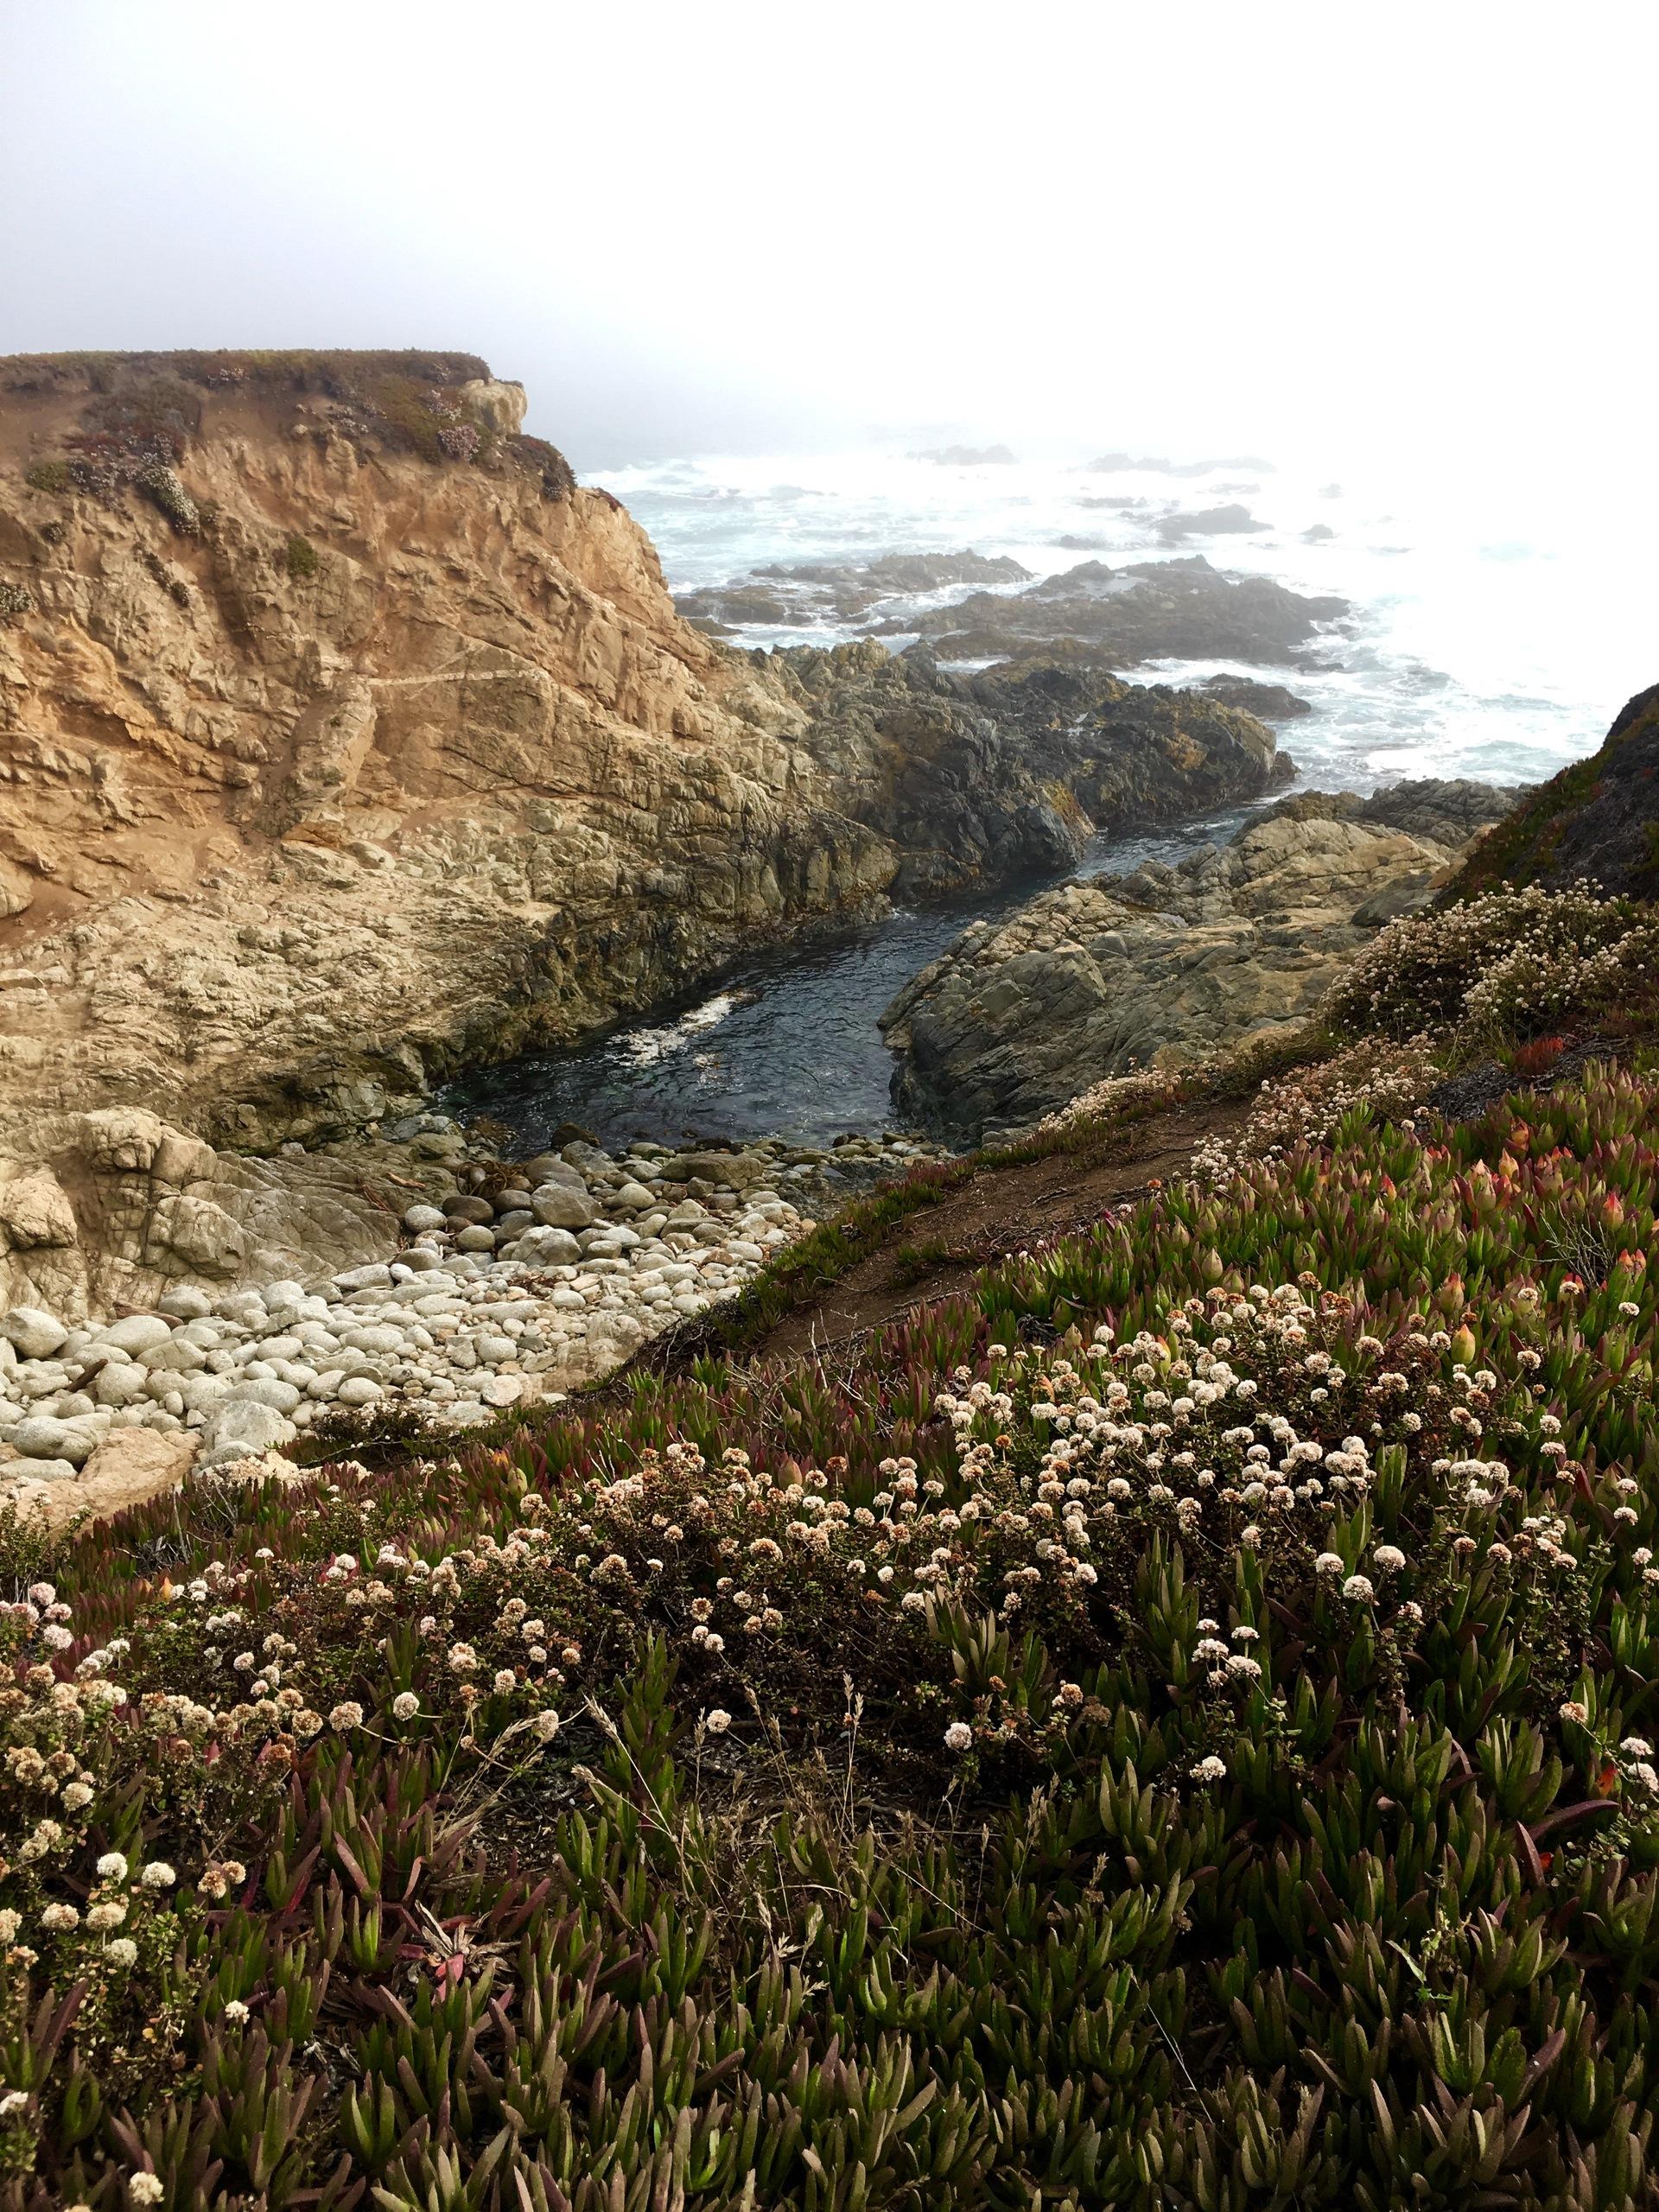 Scenic view of wildflowers near sea